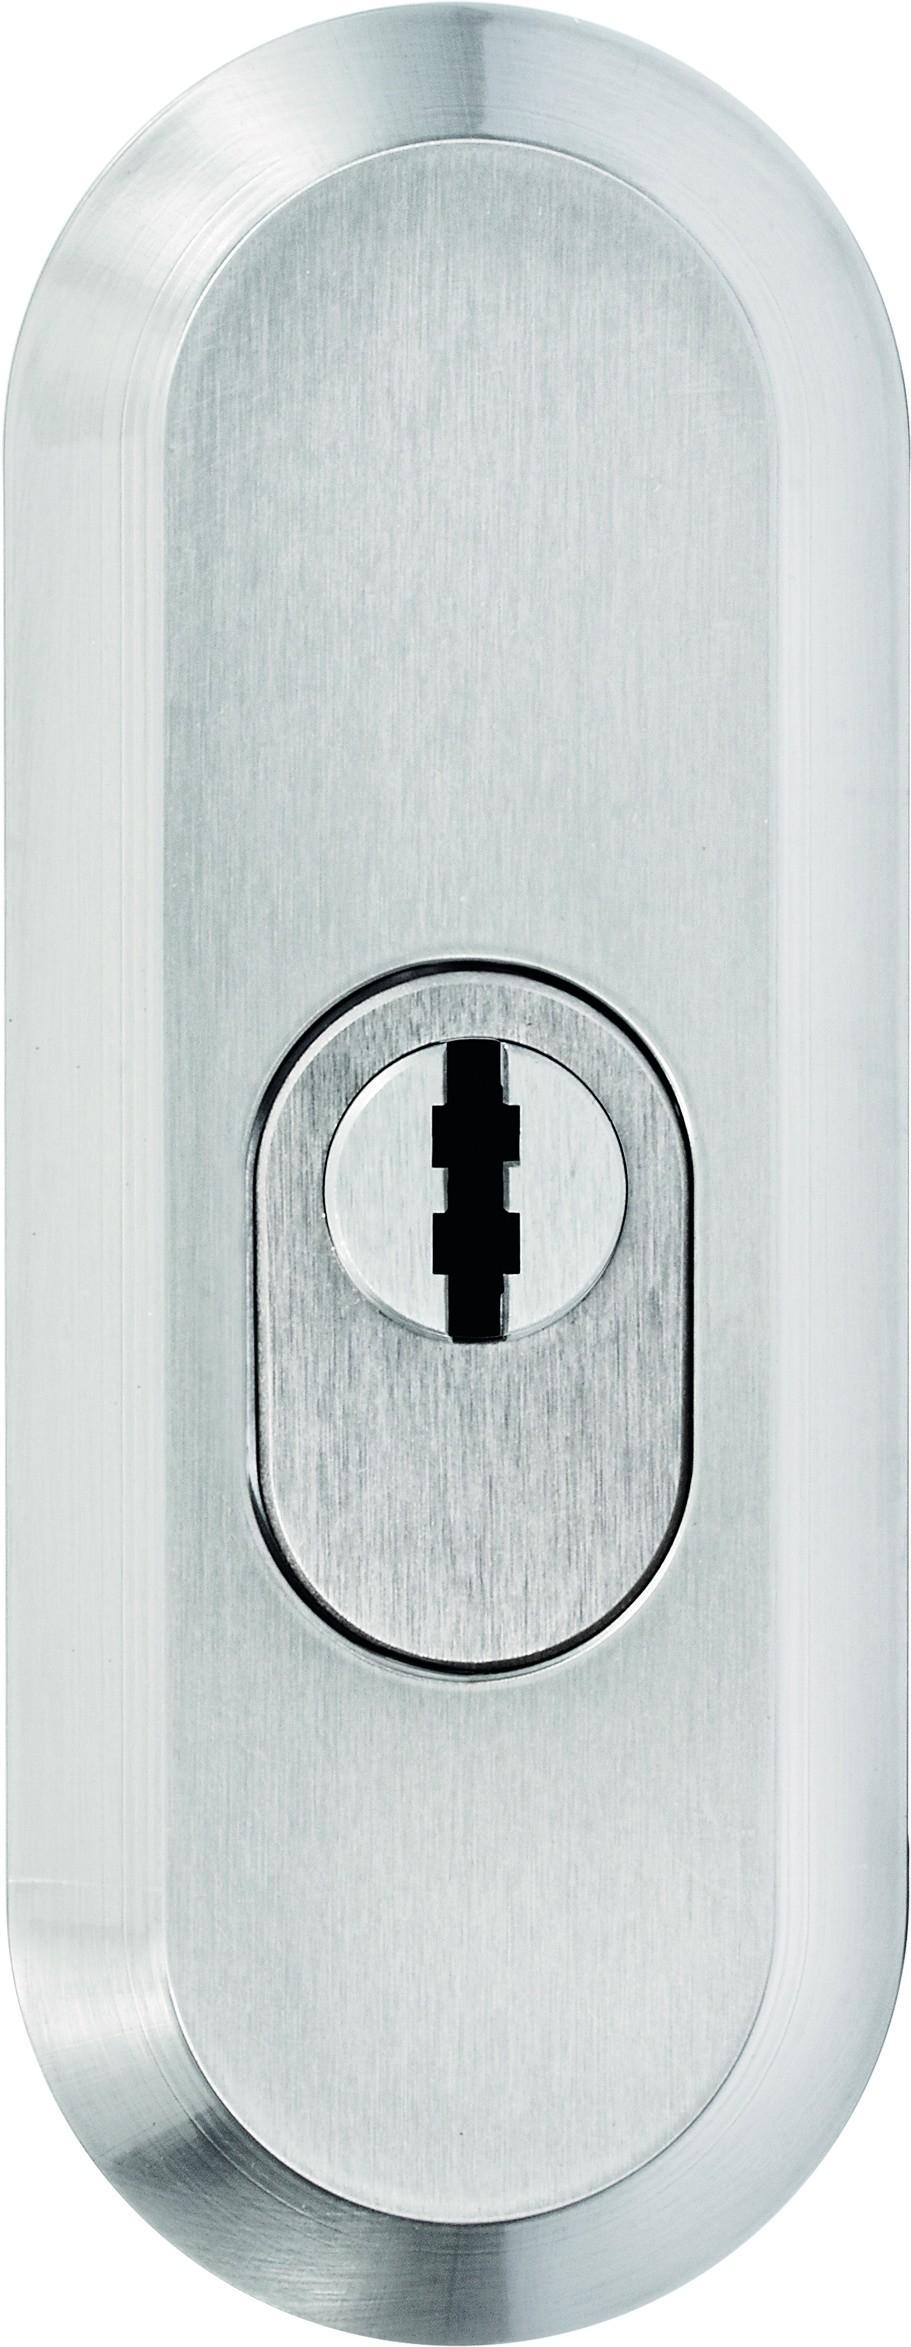 ASSA ABLOY IKON Schutzrosette mit Zylinderabdeckung S464 (neusilberfarben)